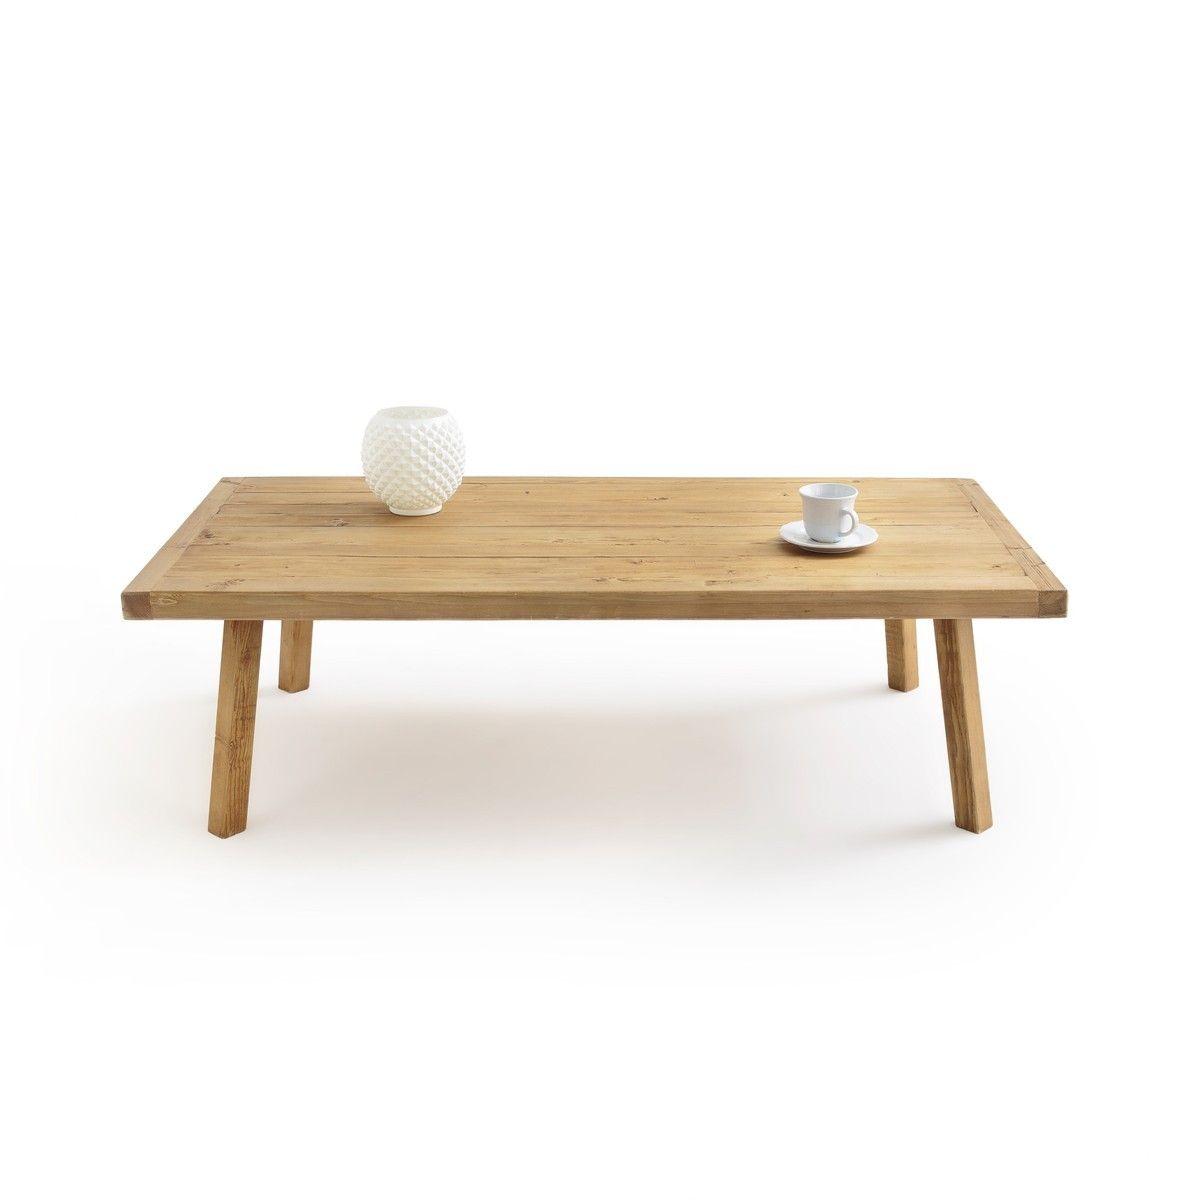 Tadako Japanese Style Coffee Table Japanese Coffee Table Coffee Table Living Room Coffee Table [ 1200 x 1200 Pixel ]